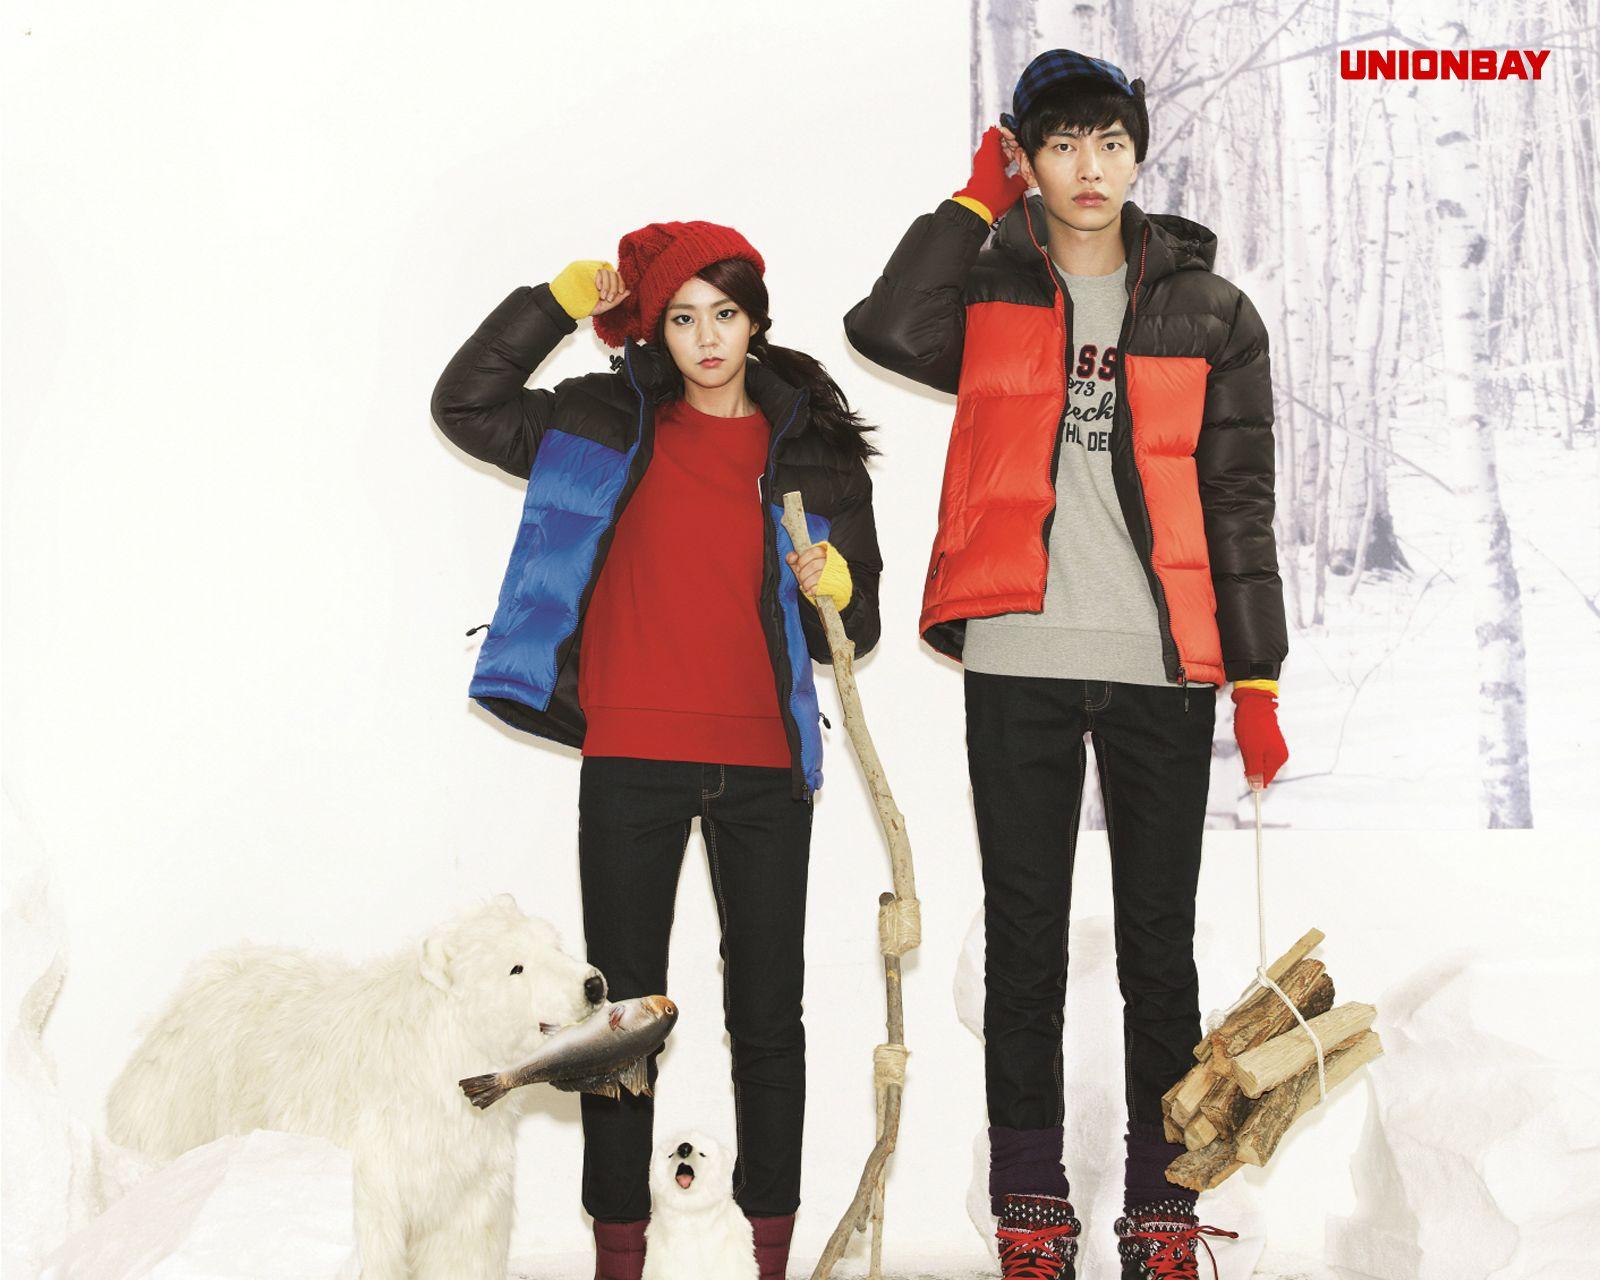 Seung yeon & Jiyoung & Lee Min Ki for Onionbay